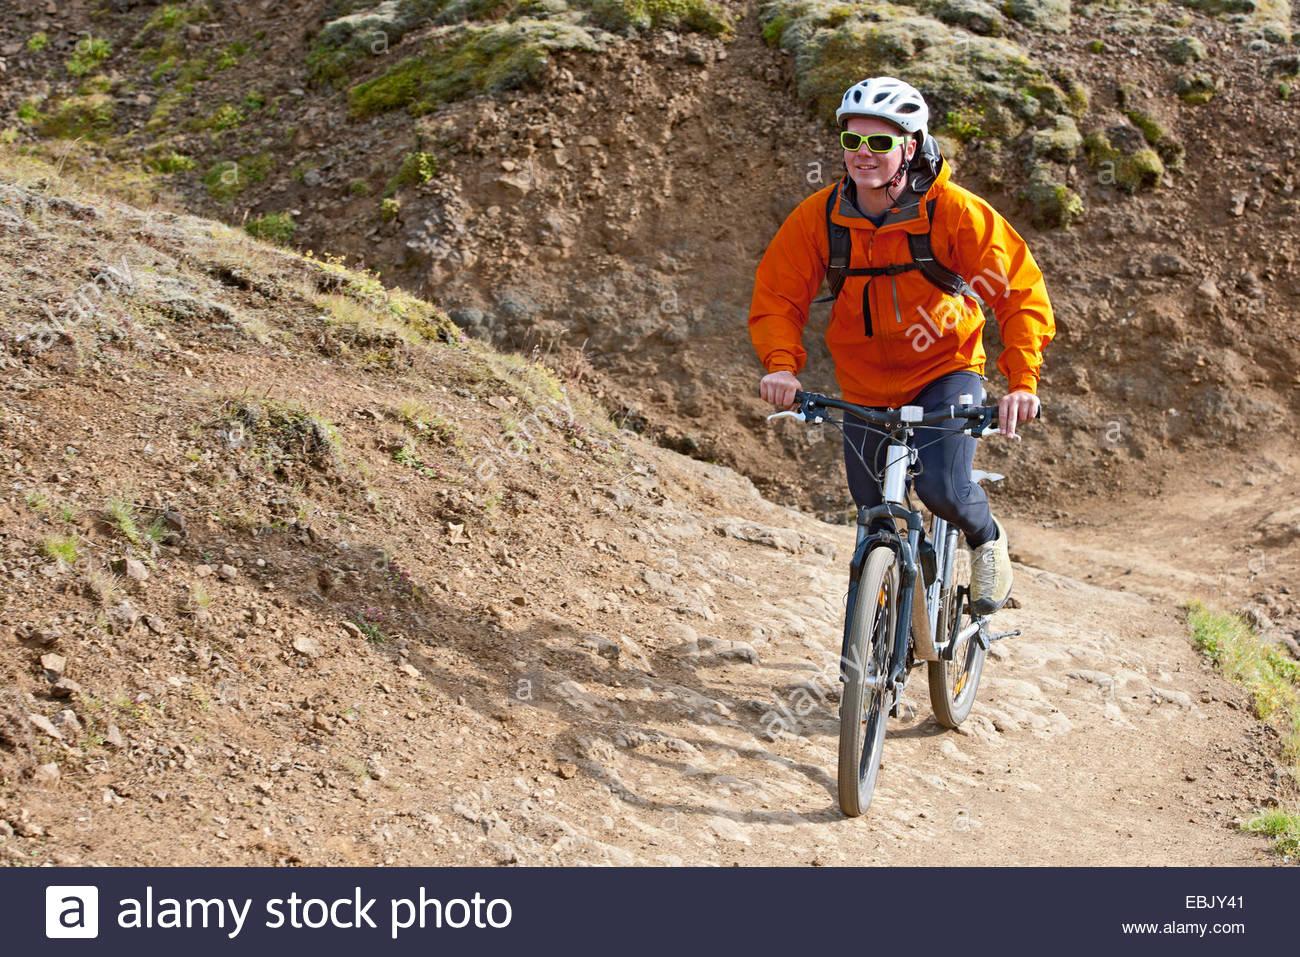 Macho joven ciclista de montaña en bicicleta de dirt track, valle Reykjadalur, Suroeste de Islandia Imagen De Stock